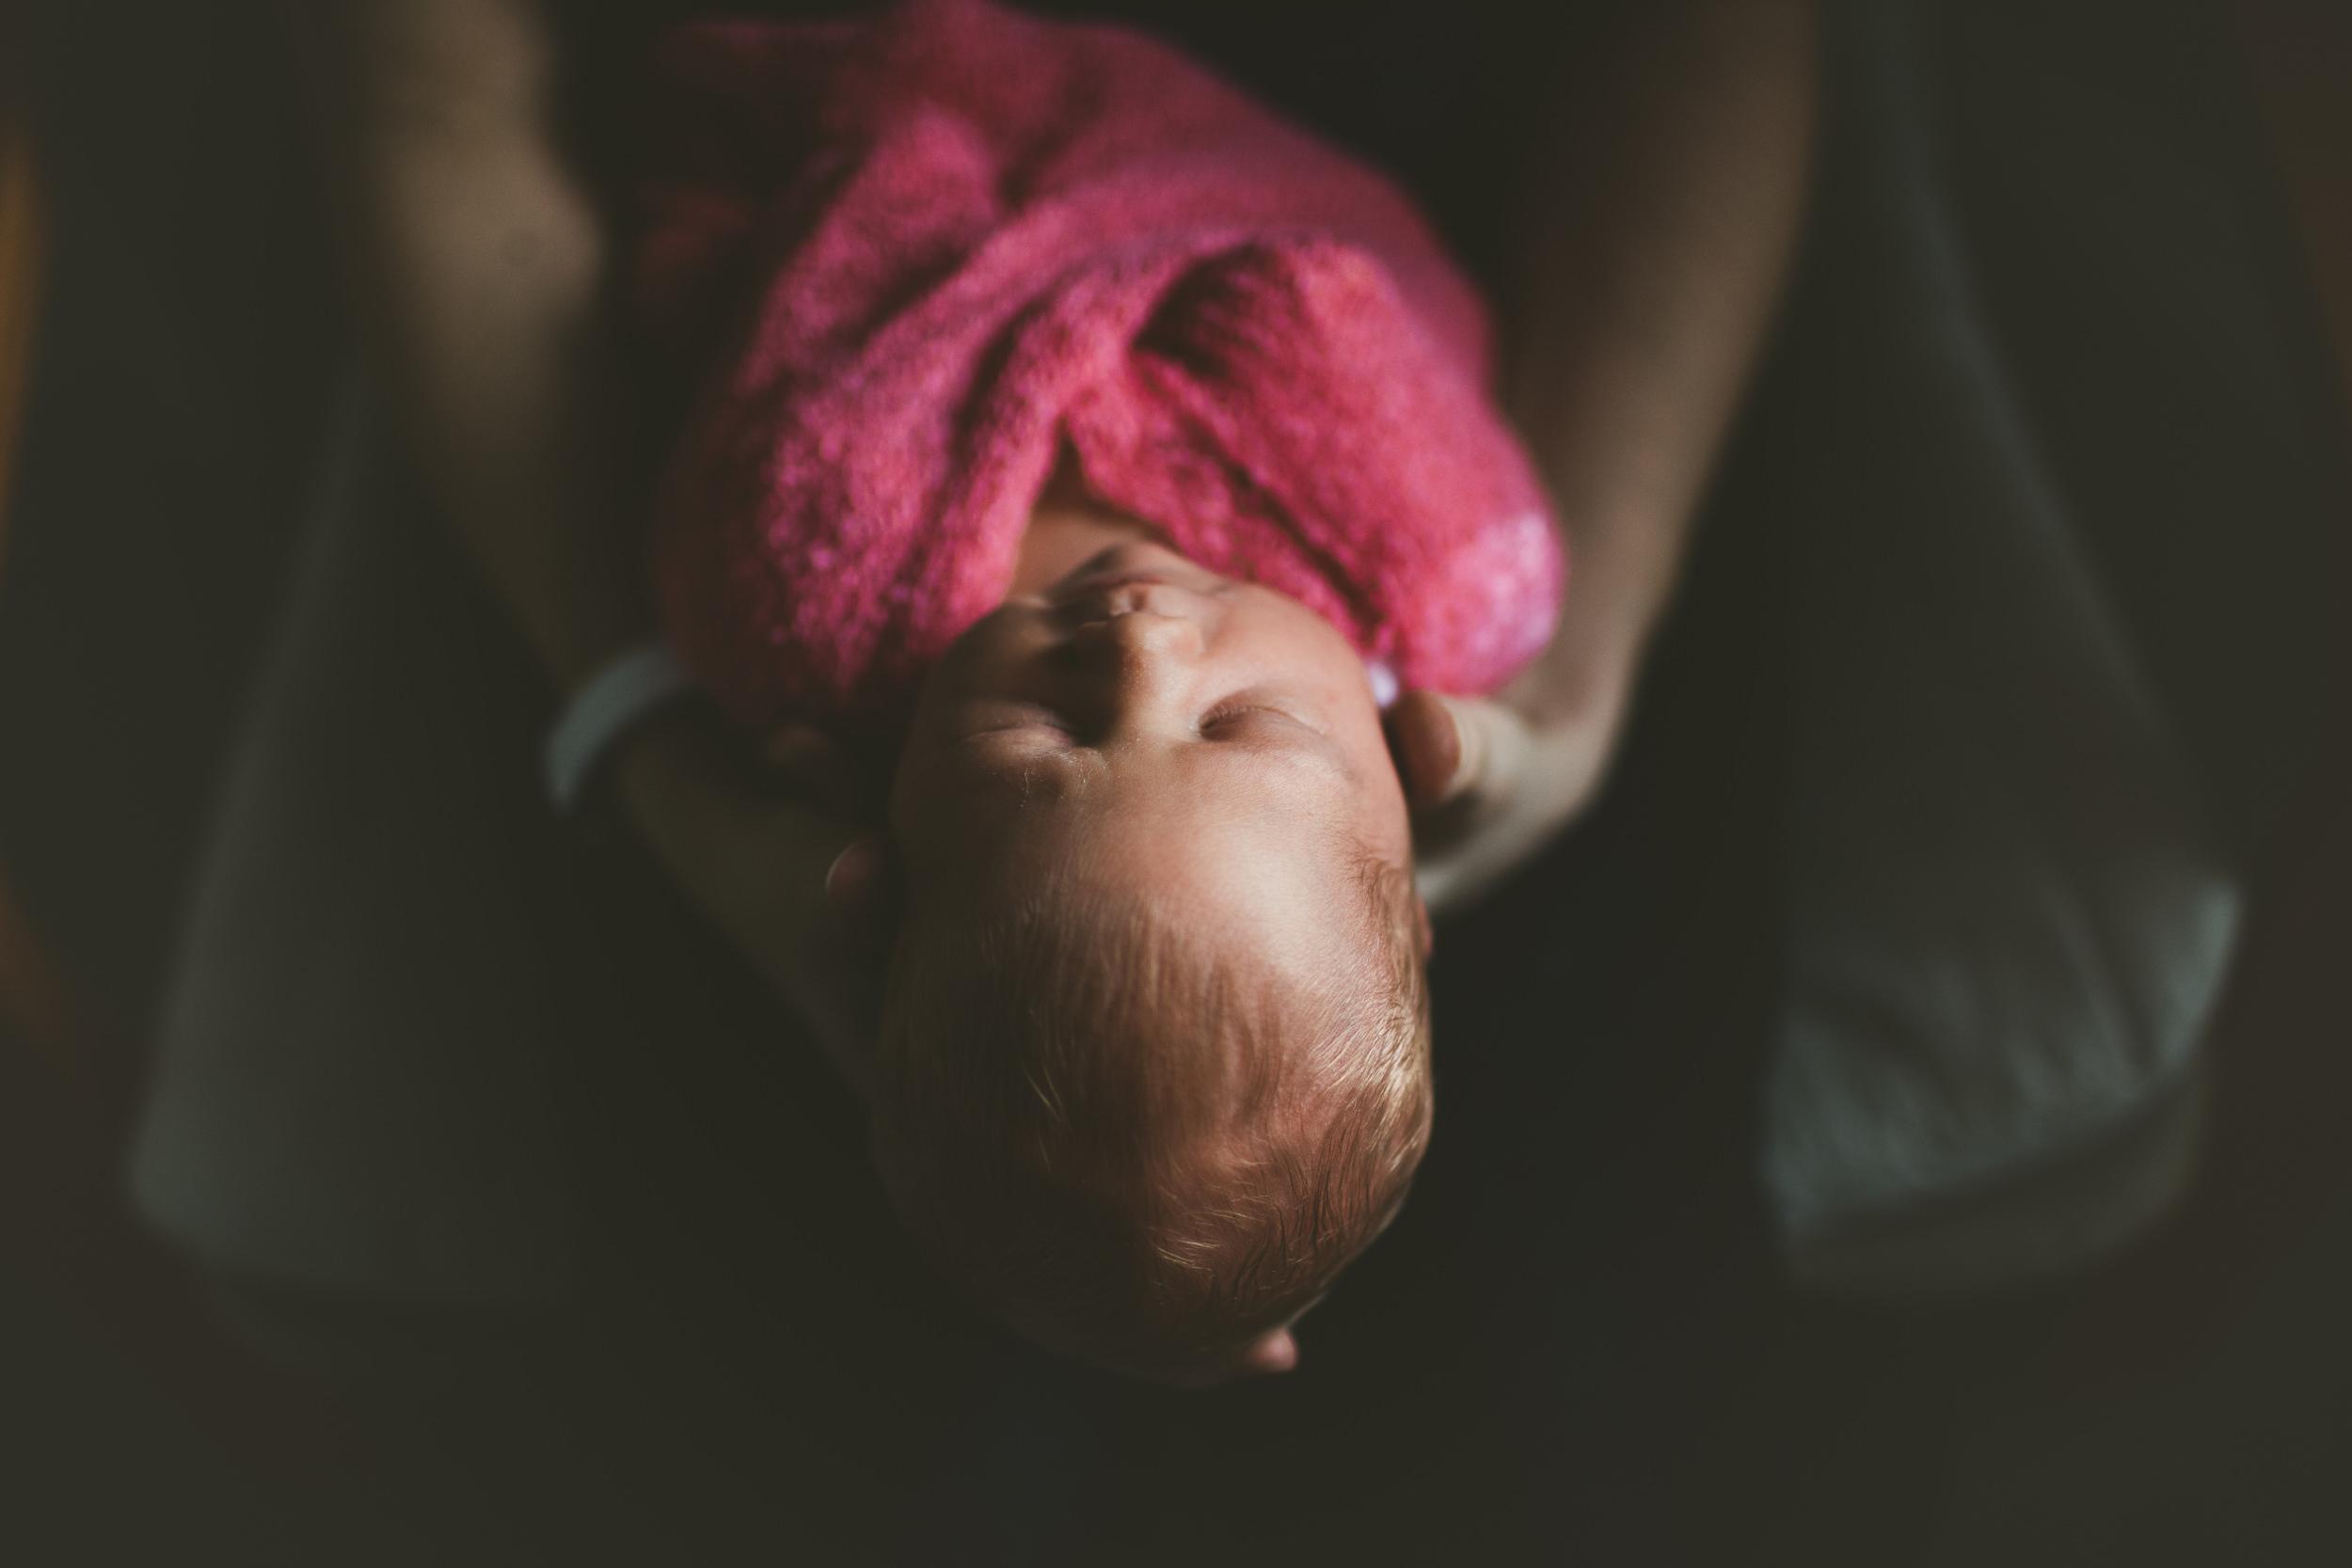 toronto newborn photographer, toronto newborn twin photographer, toronto newborn lifestyle photographer, toronto twin lifestyle photographer, toronto lifestyle photographer